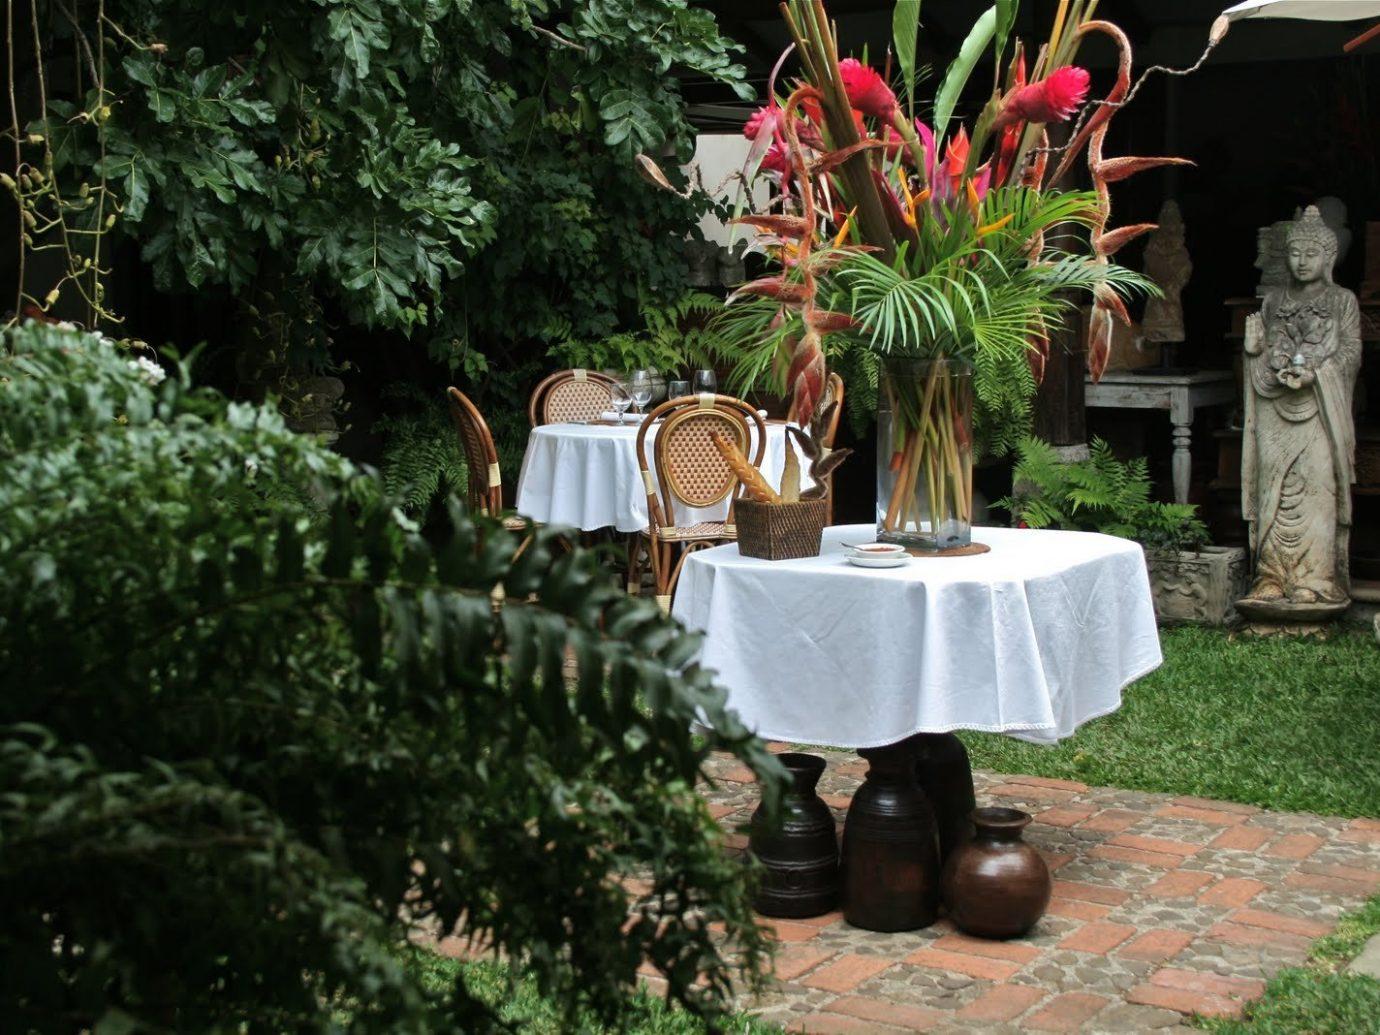 Food + Drink Trip Ideas tree Garden outdoor plant flora yard flowerpot backyard flower grass outdoor structure lawn landscaping shrub arecales houseplant furniture